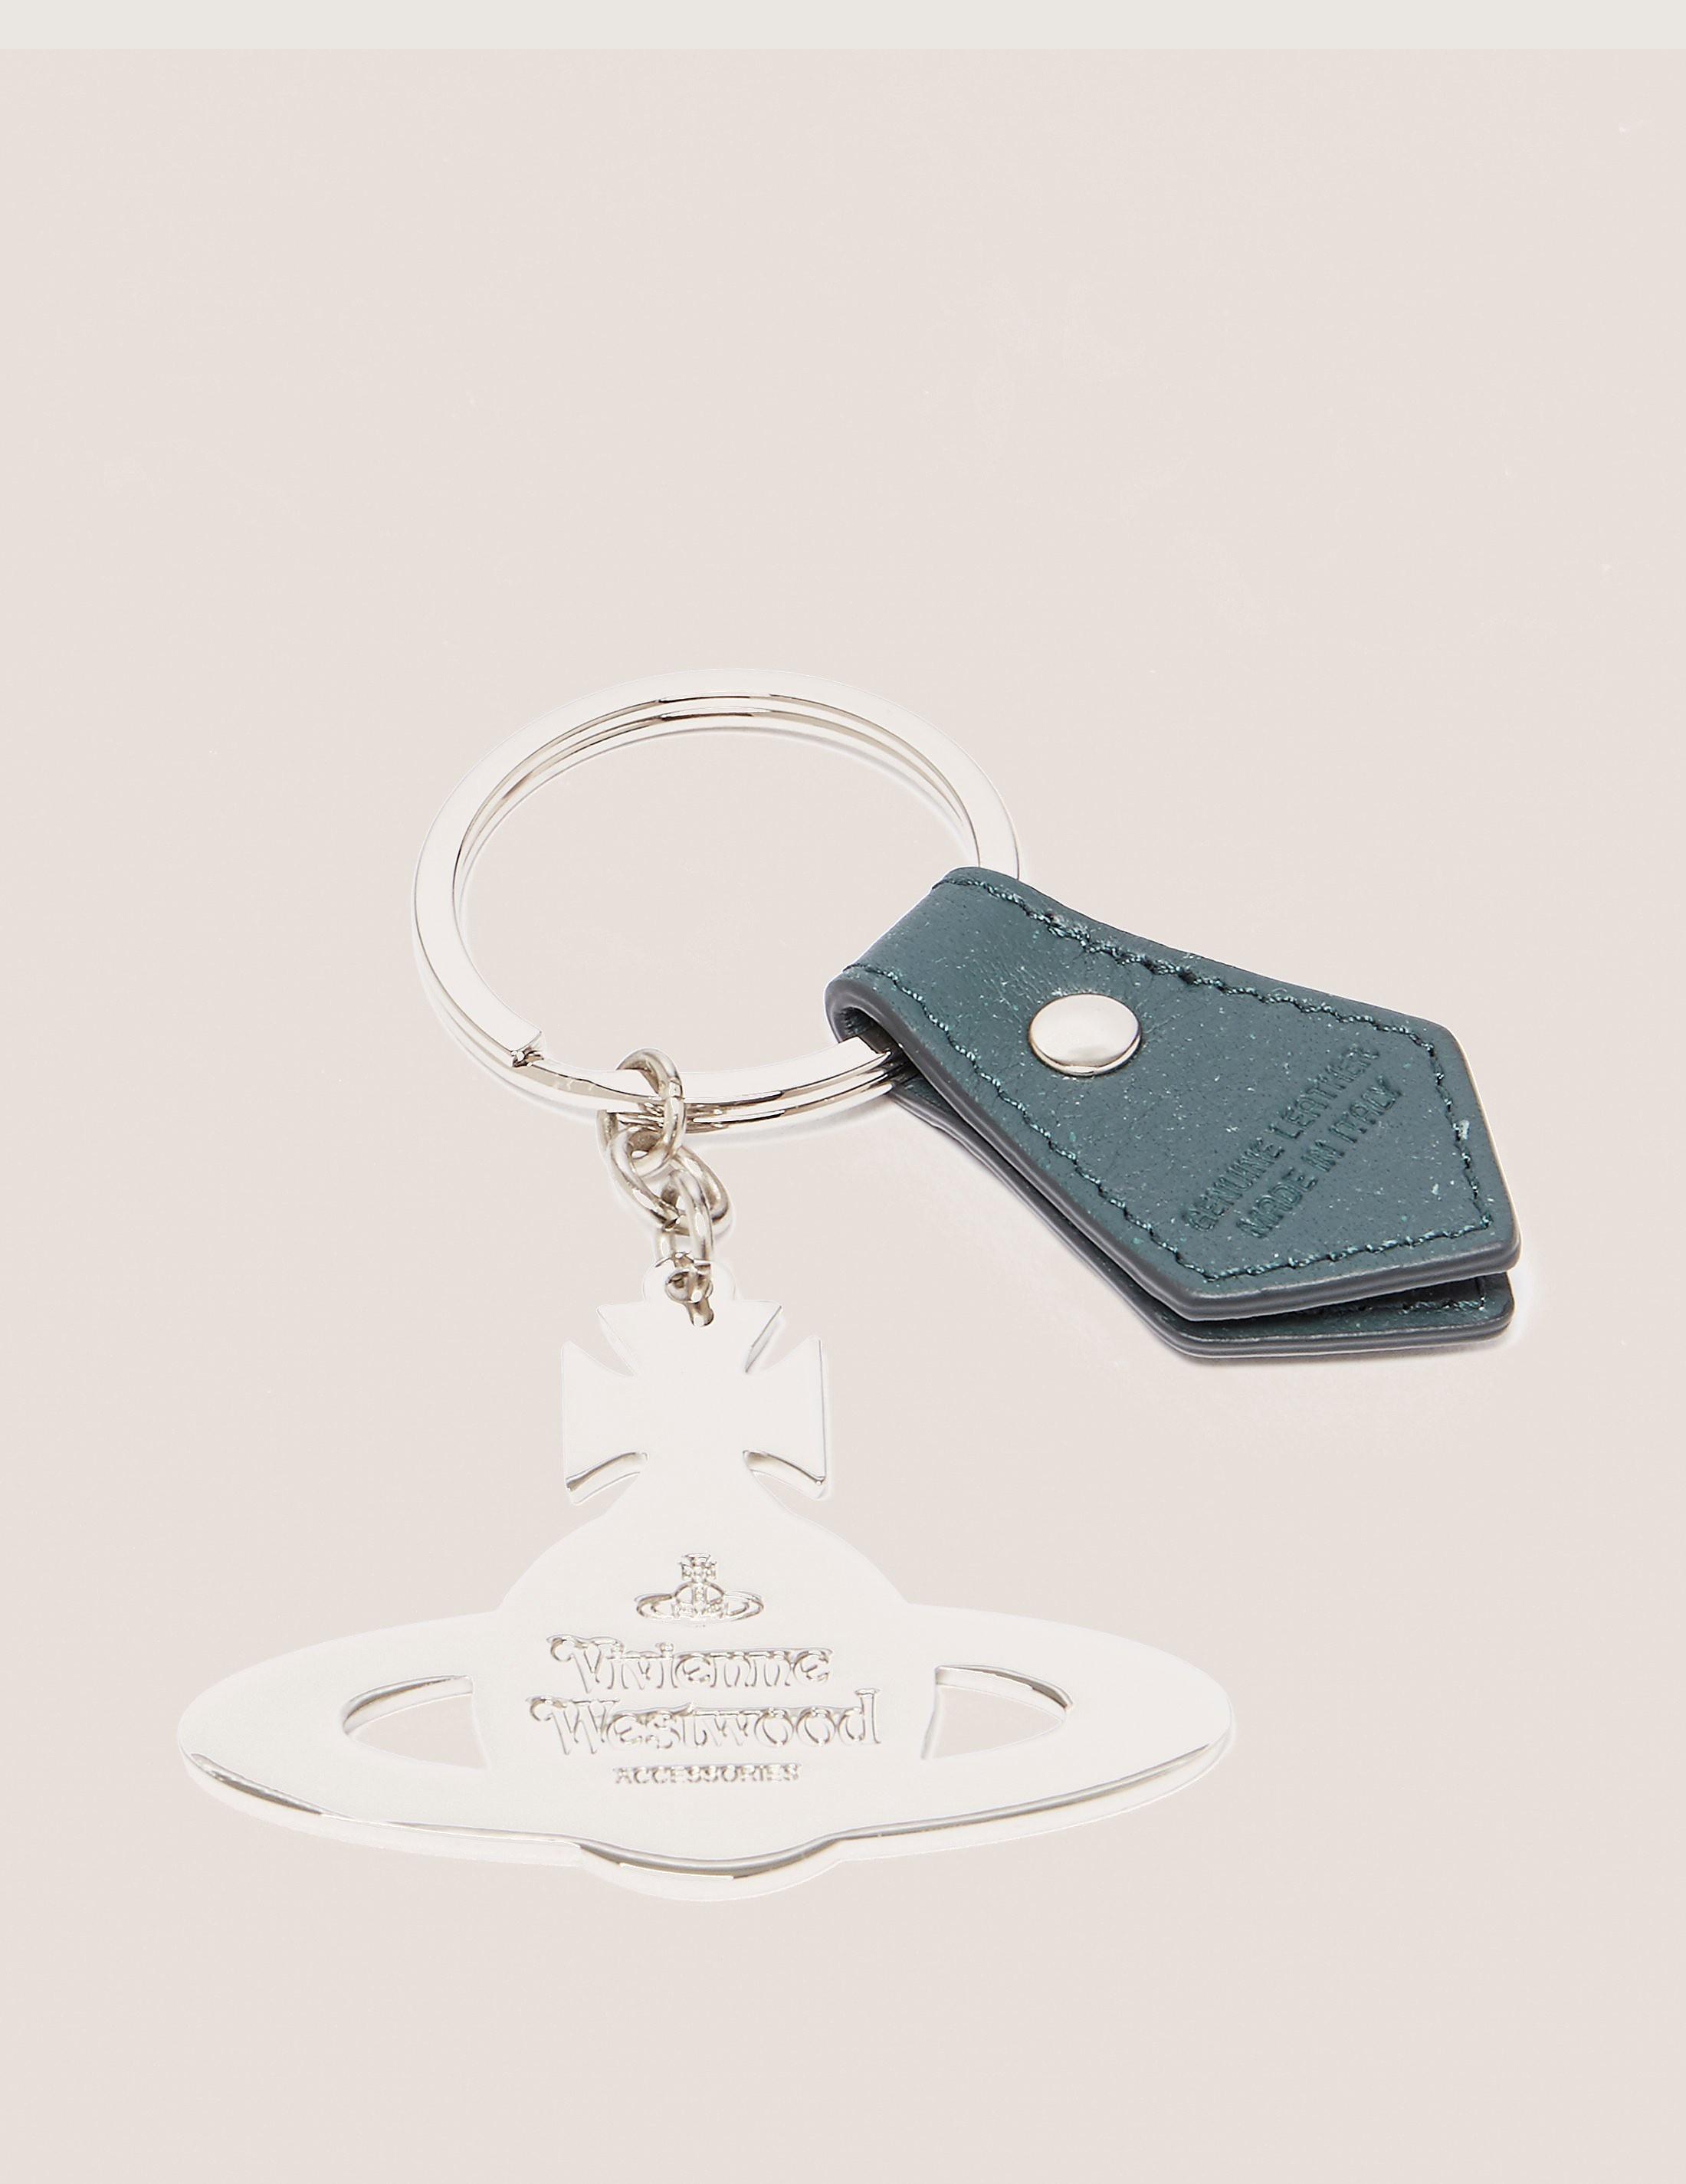 Vivienne Westwood Orb Key Chain